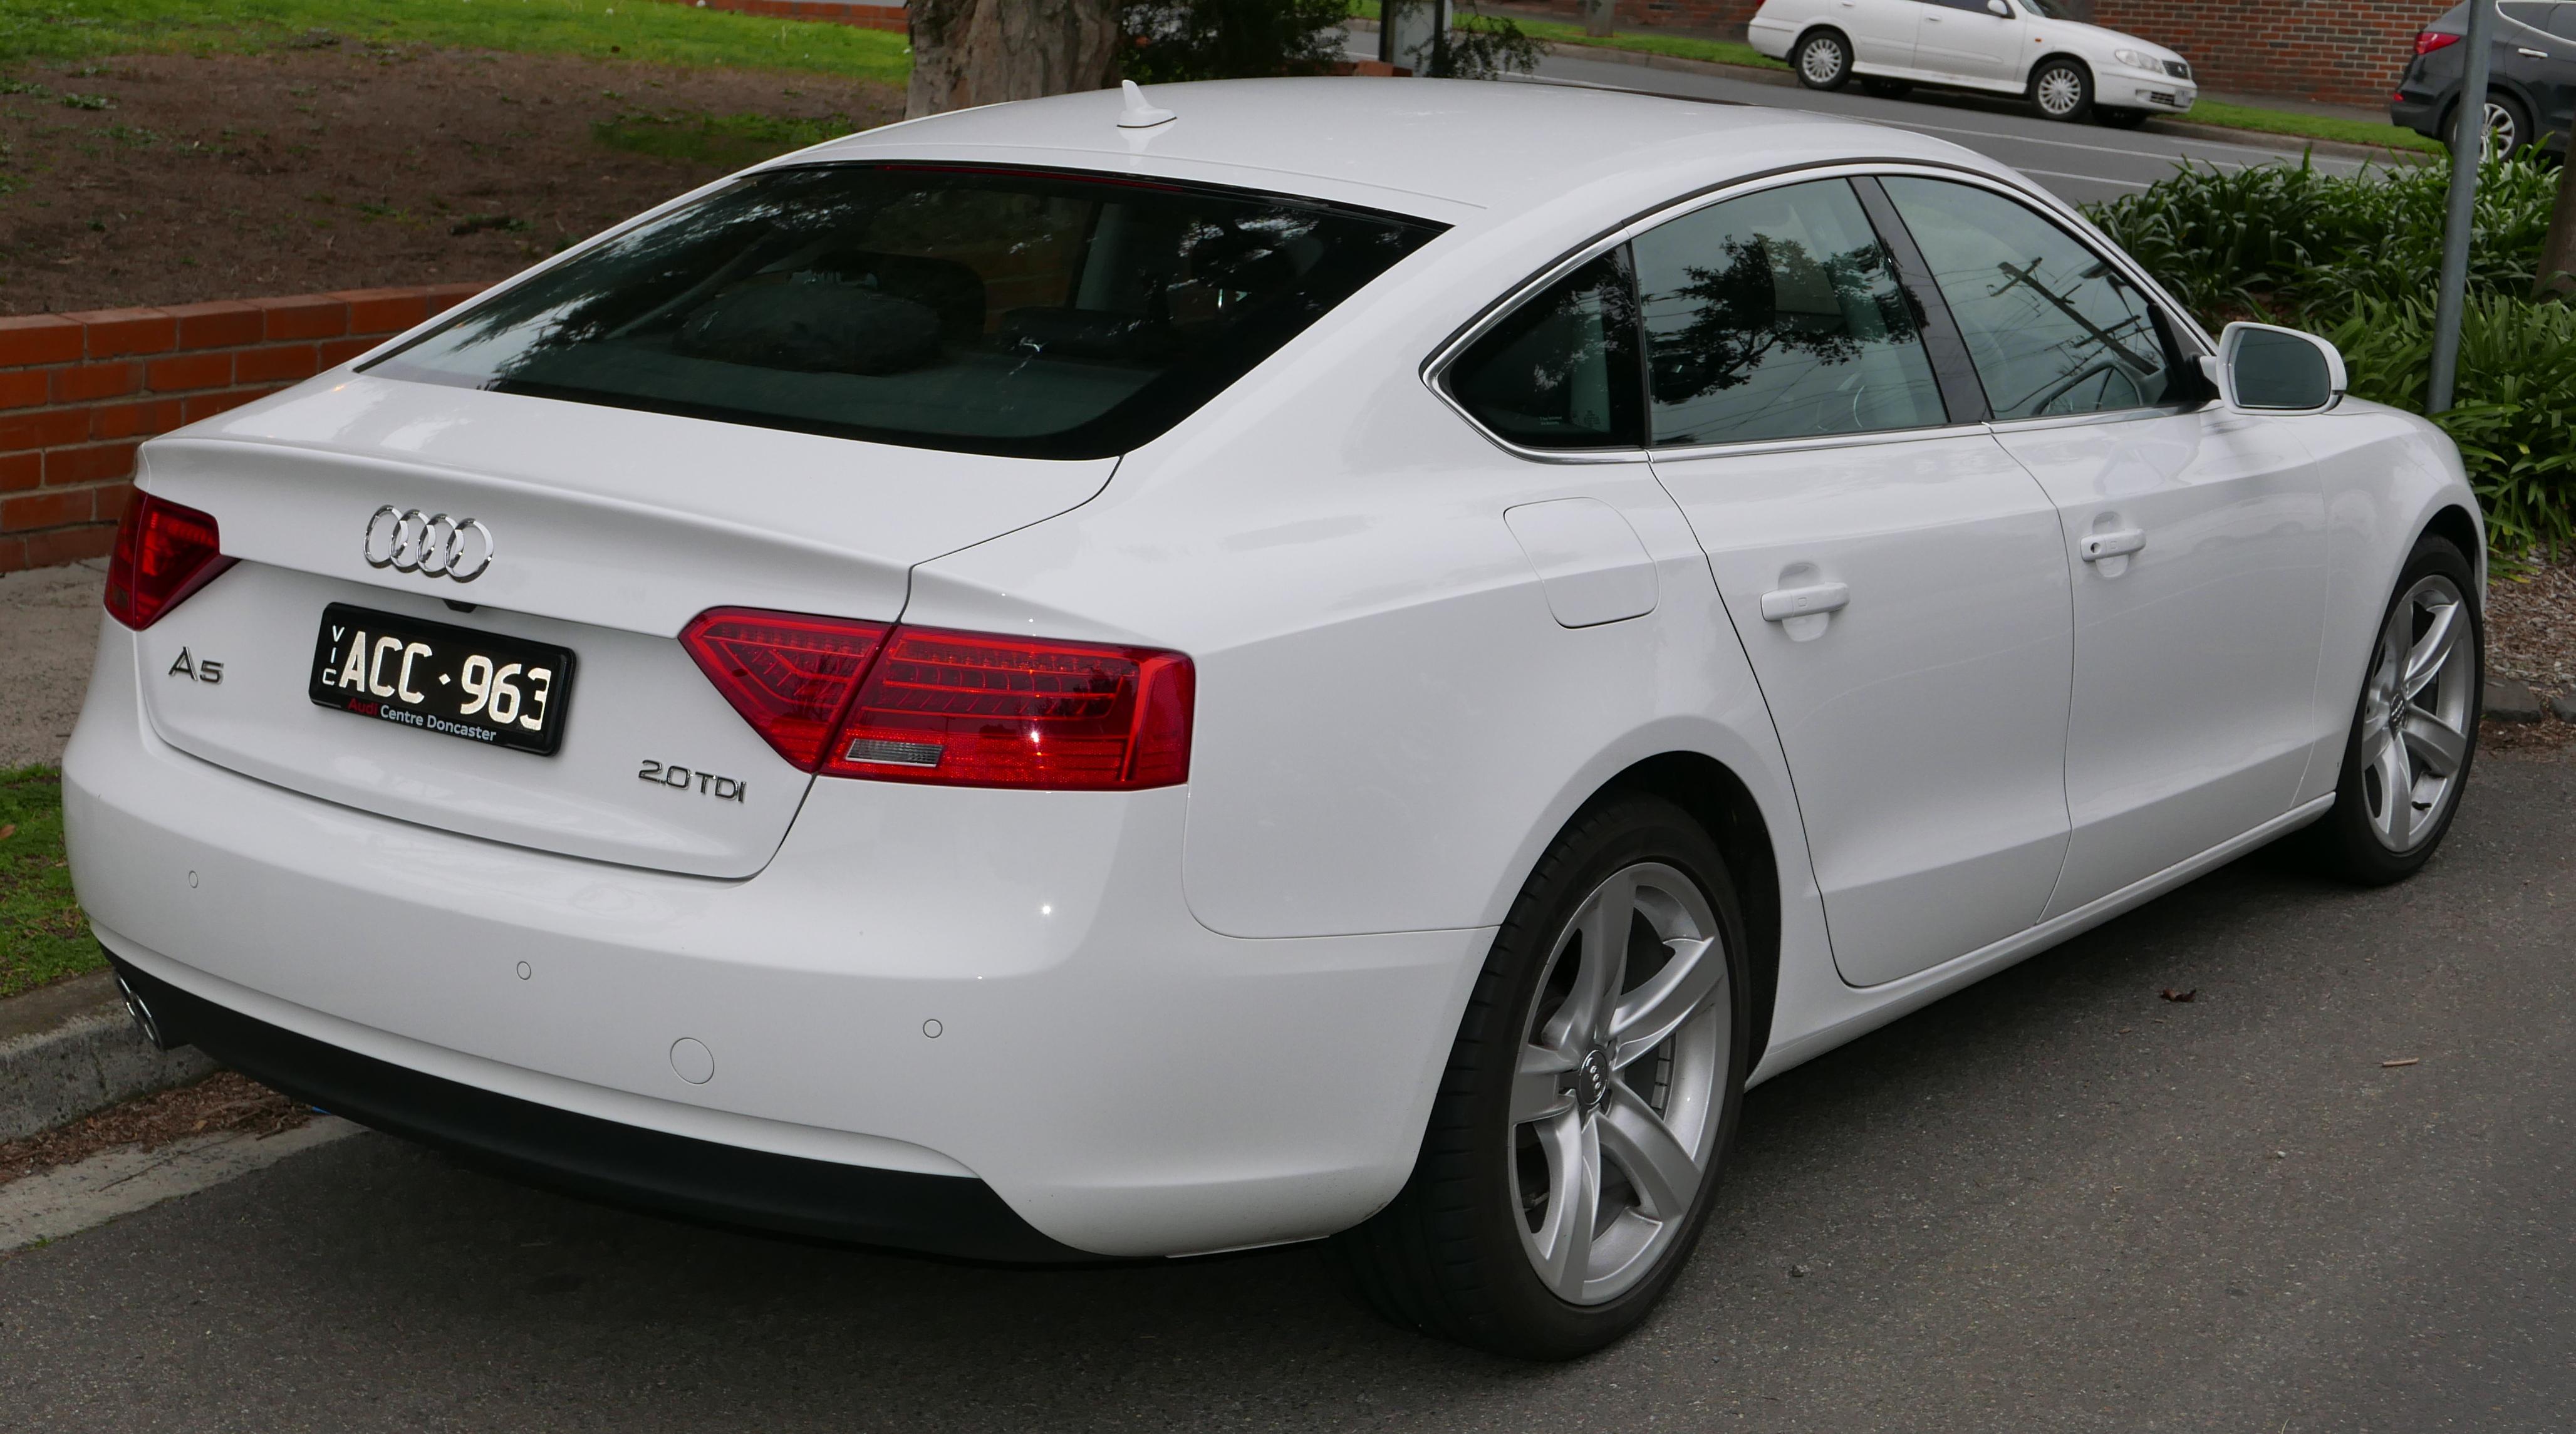 File:2014 Audi A5 (8T MY14) 2.0 TDI quattro Sportback ...